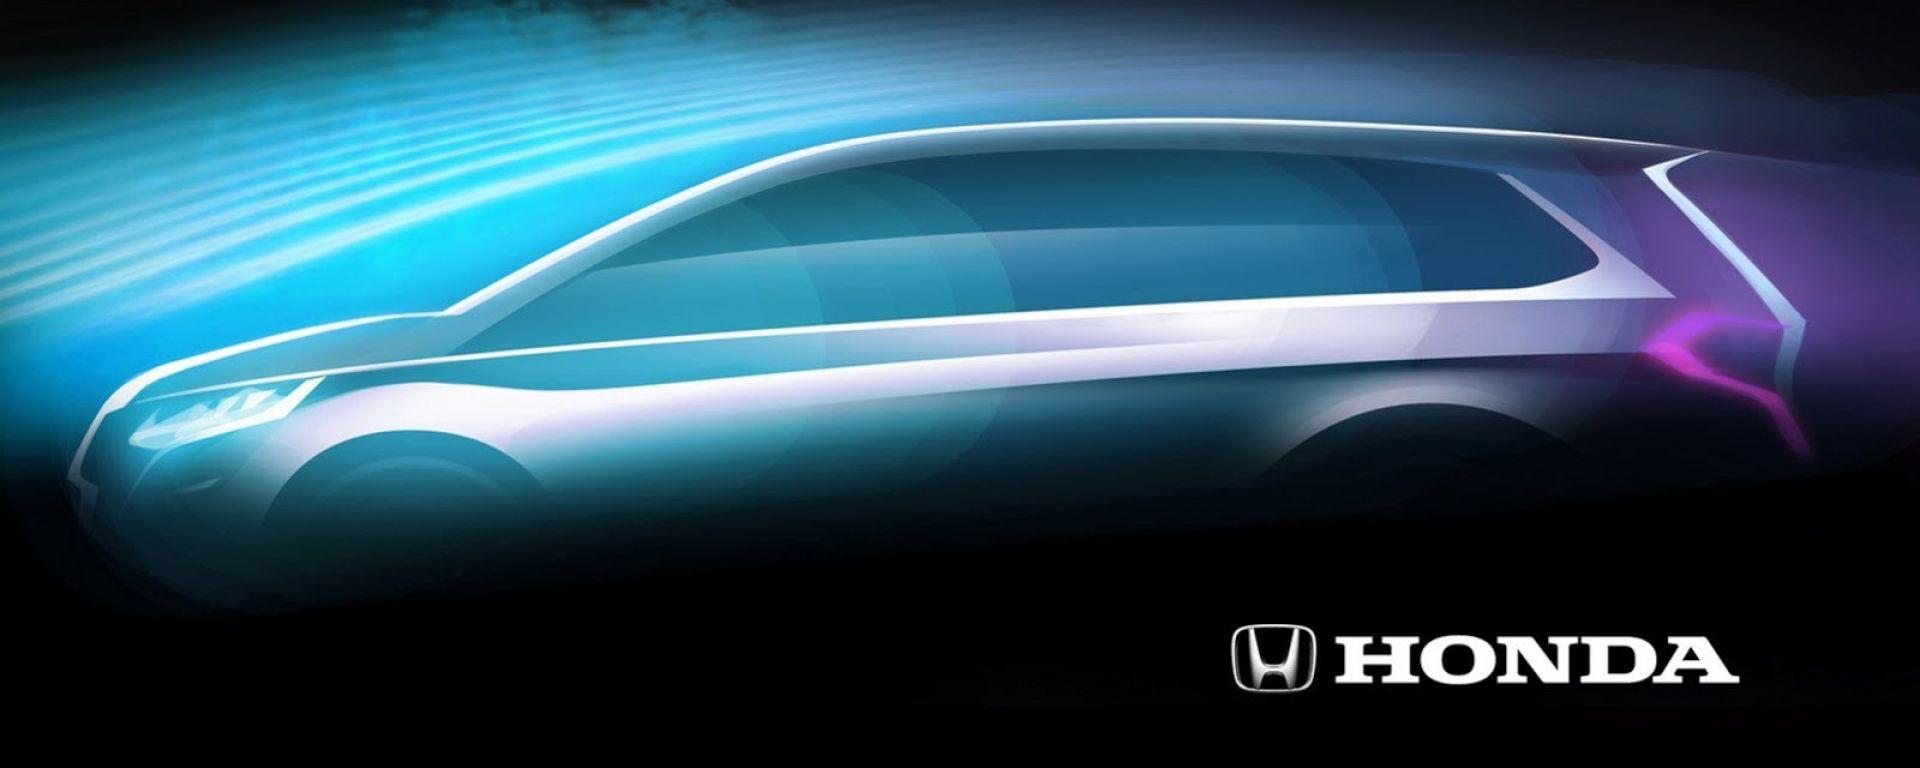 Honda: una nuova concept a Shanghai